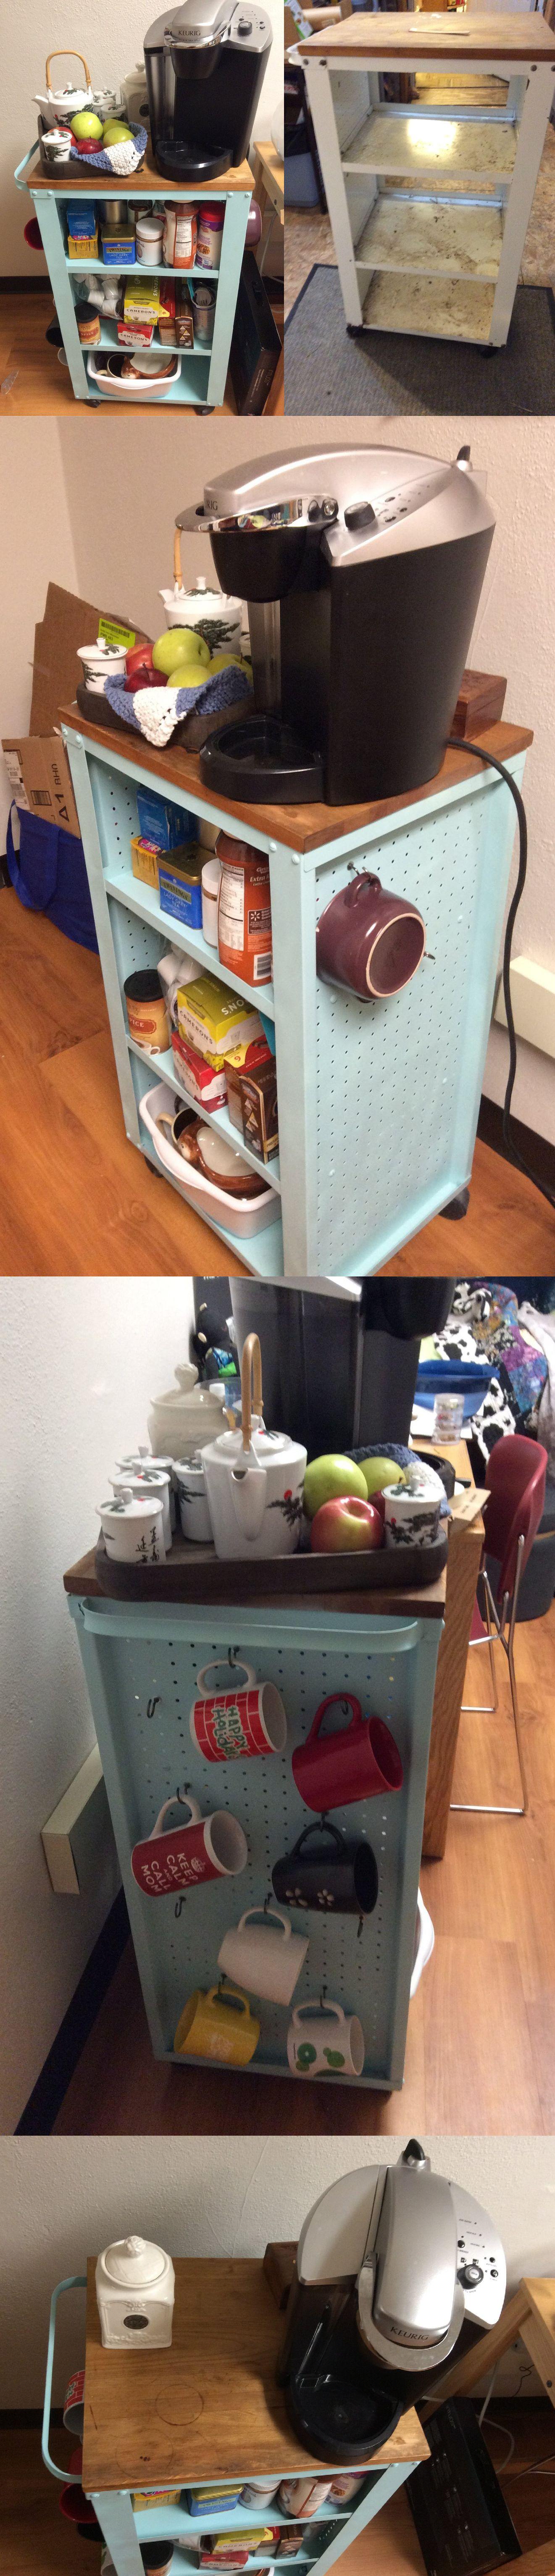 DIY Dorm room cart, before and after, kitchen cart, peg